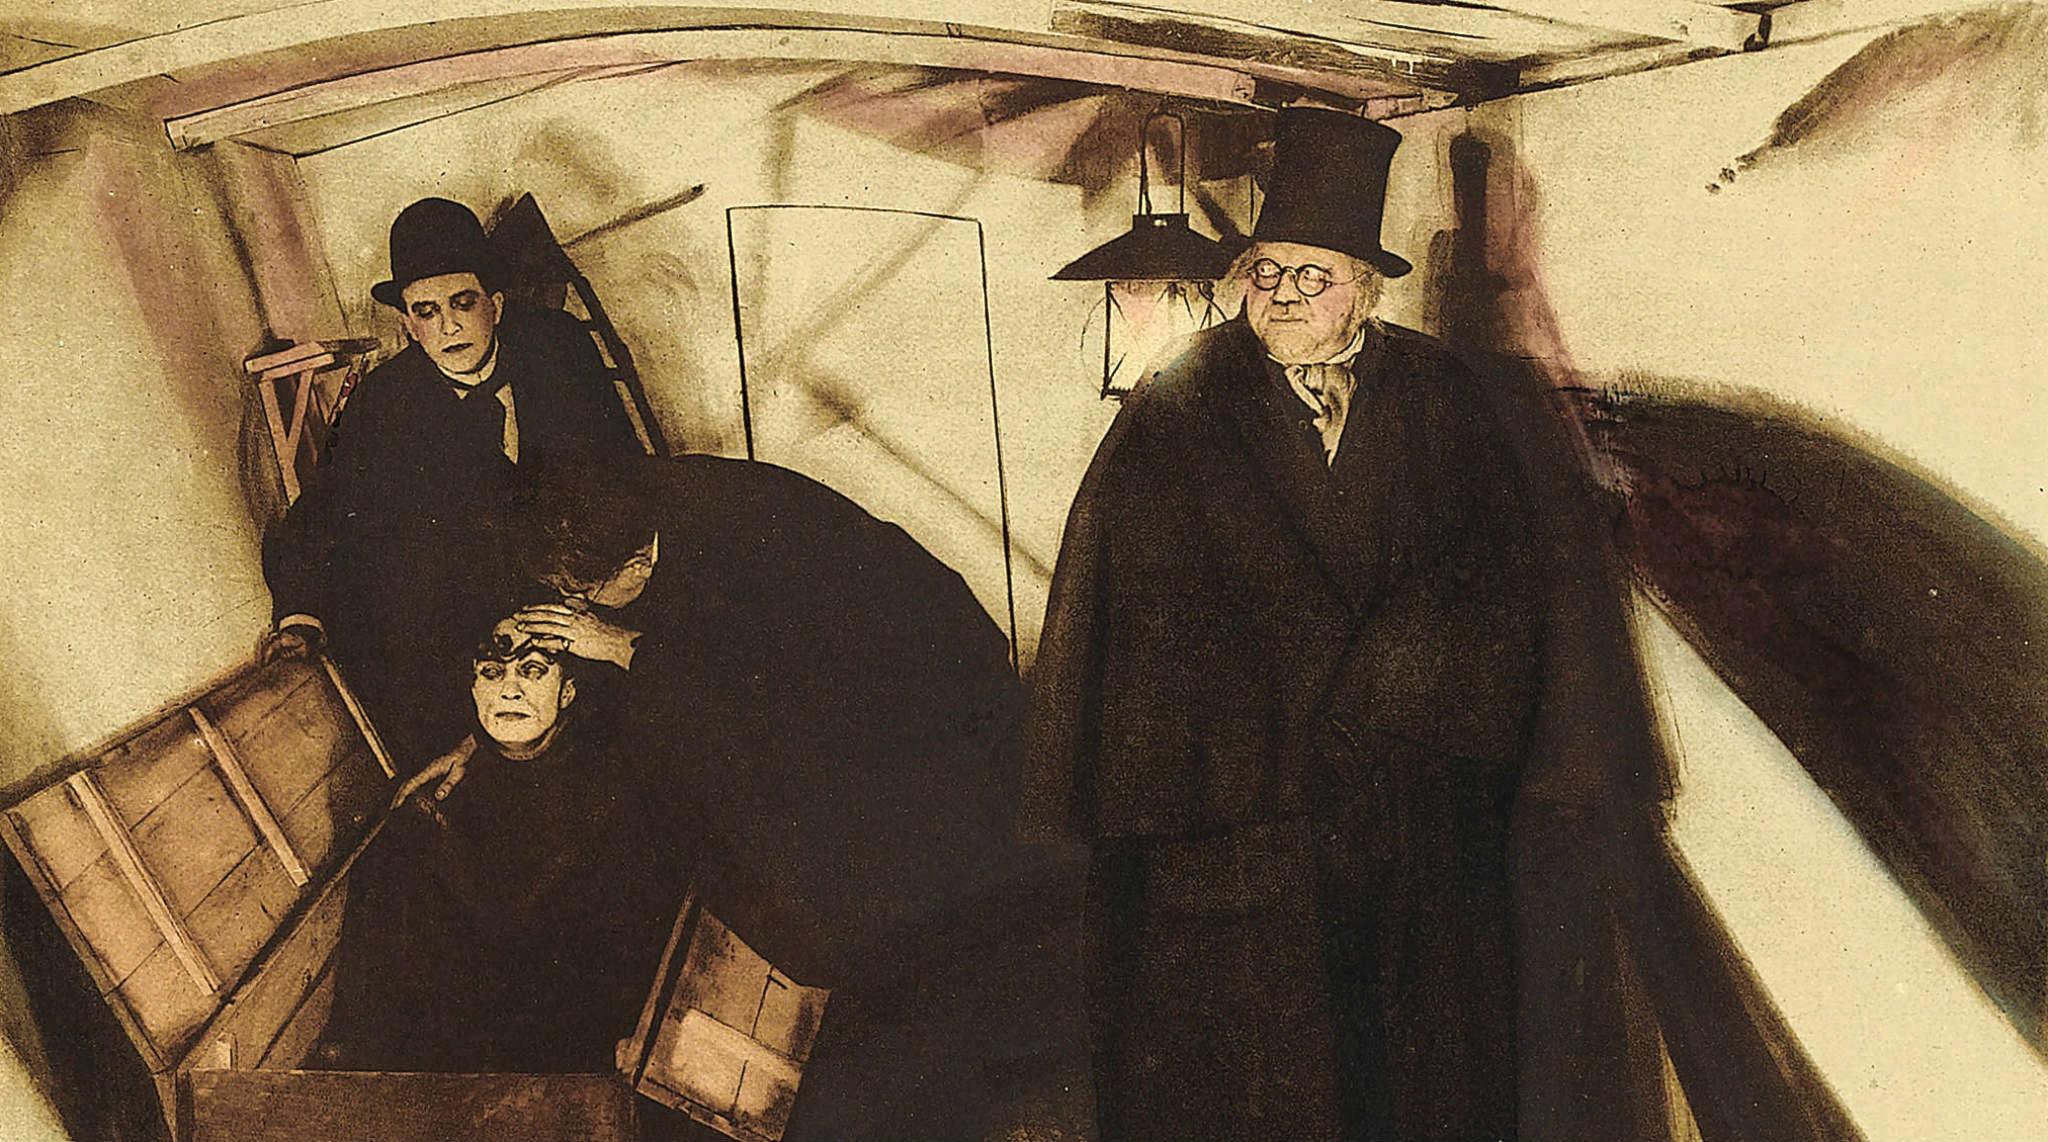 Dr Caligaris kabinett